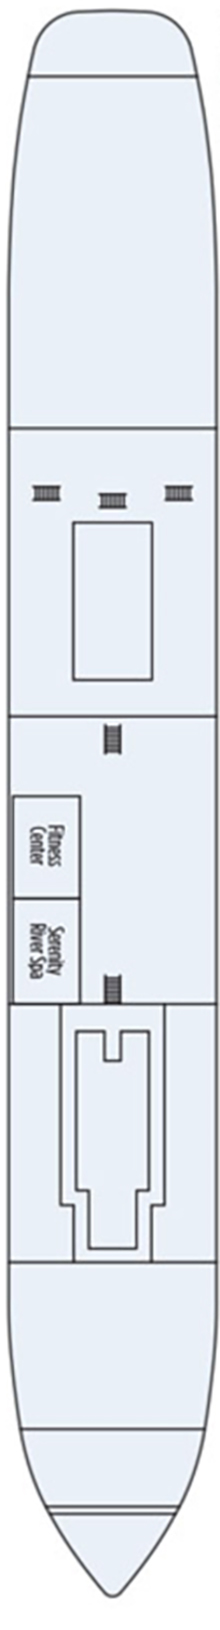 Onega Deck